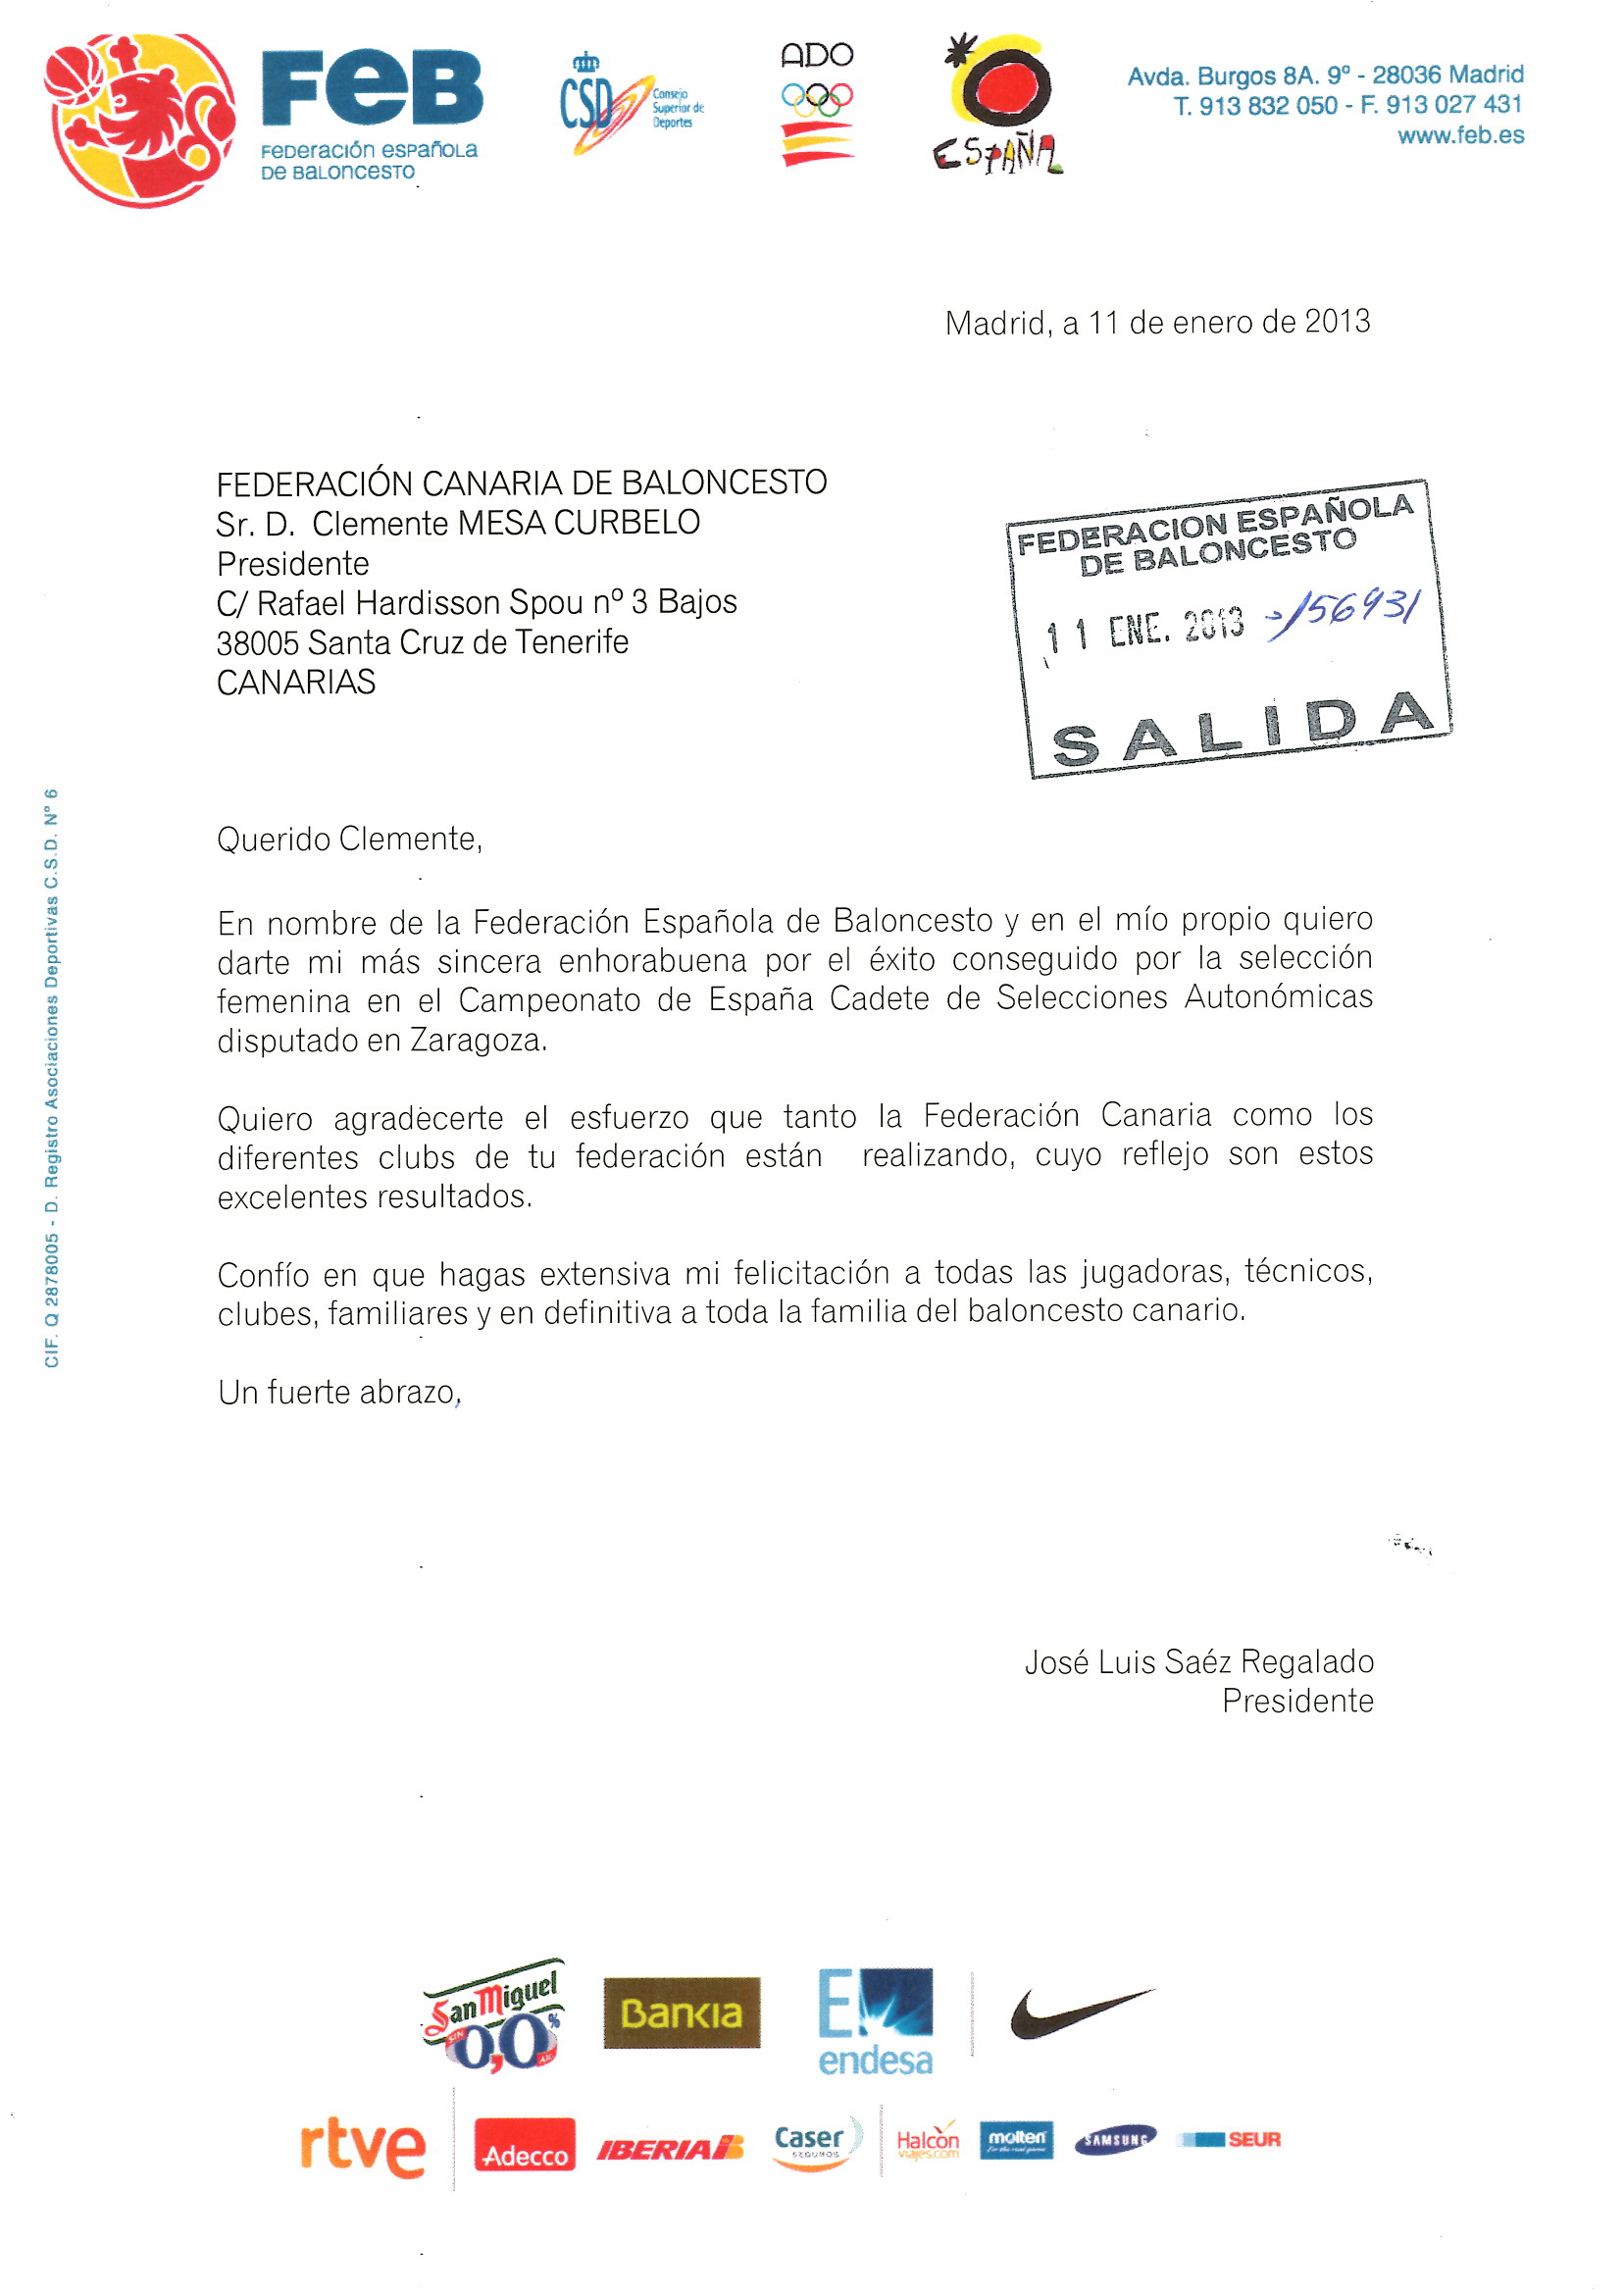 CARTA DE D. JOSÉ LUIS SÁEZ  a la Att. CLEMENTE MESA.jpg